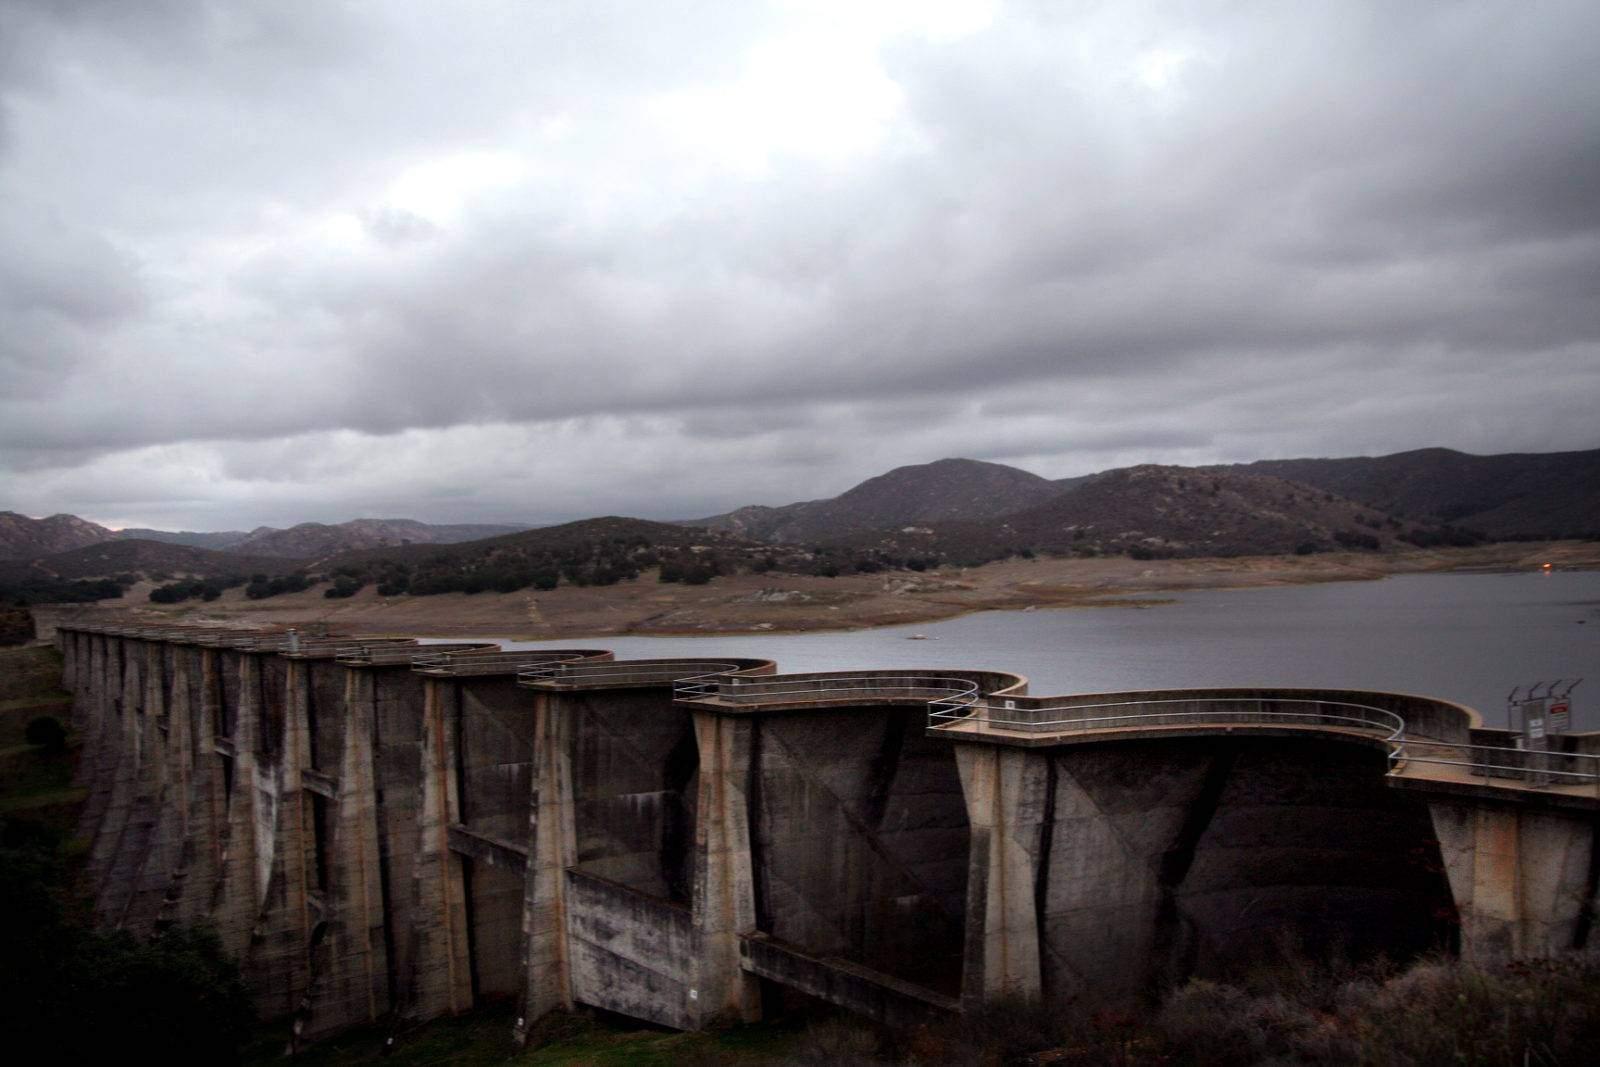 Explore the historic Sutherland dam in Ramona. Beautiful views of Sutherland Lake and fun adventures await!